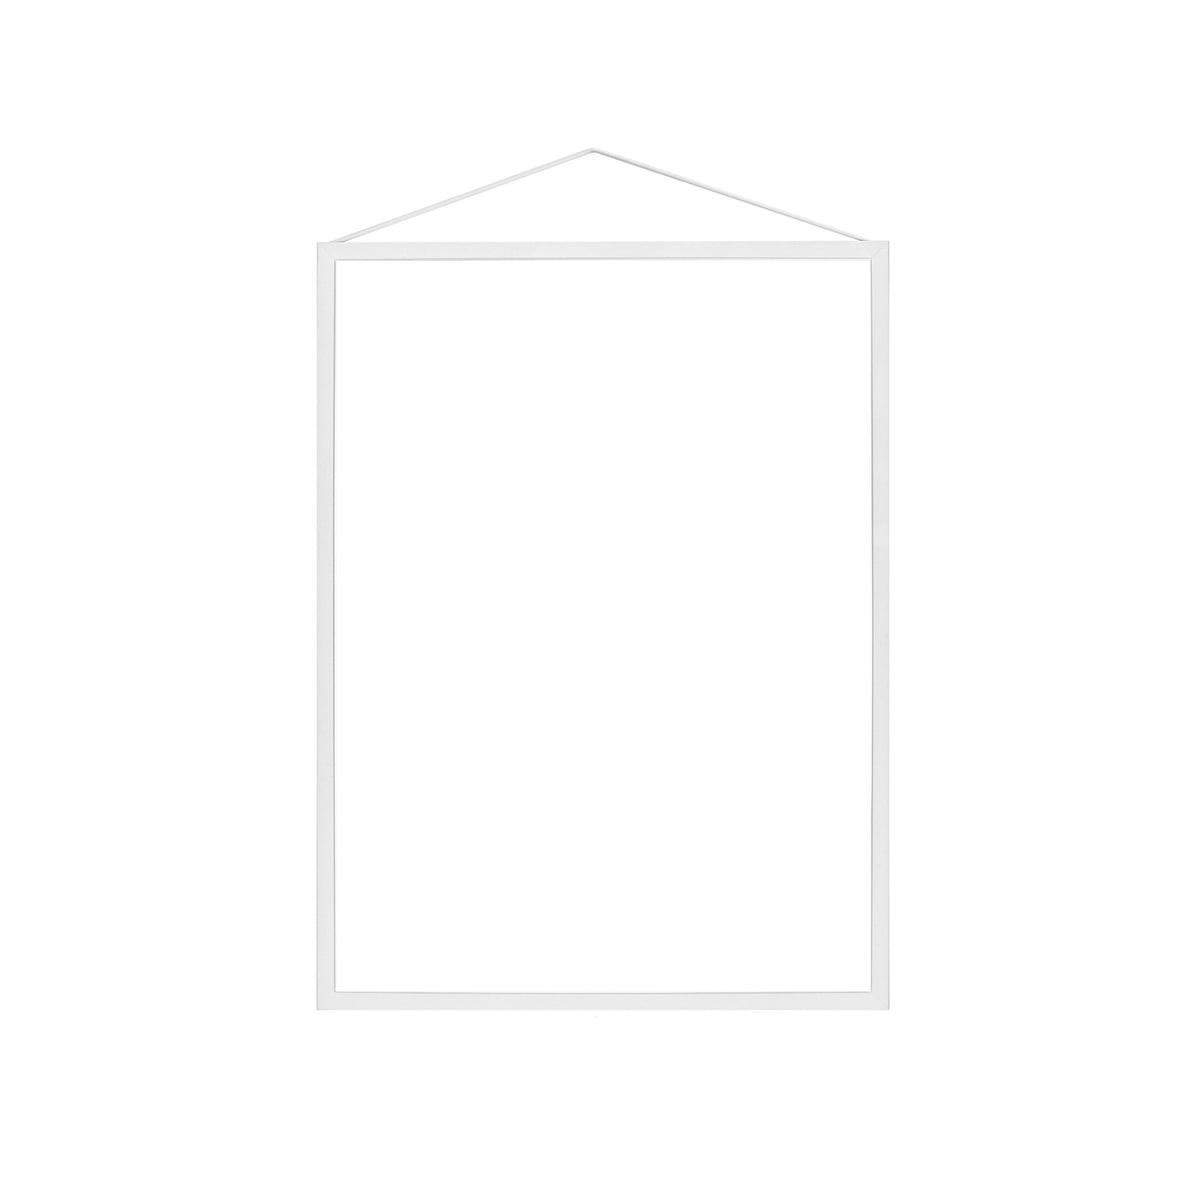 MOEBE - Frame Bilderrahmen A3, weiß